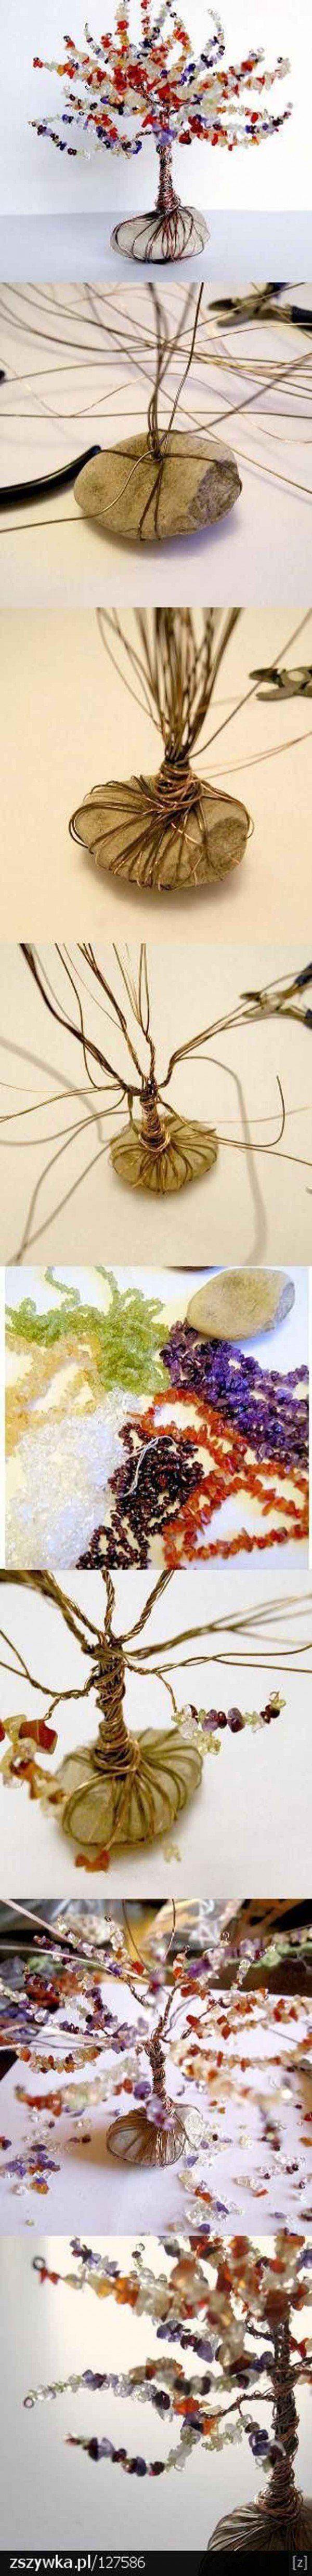 Adorable idea for a DIY decorative tree made of old jewelry and rocks @istandarddesignrockfun